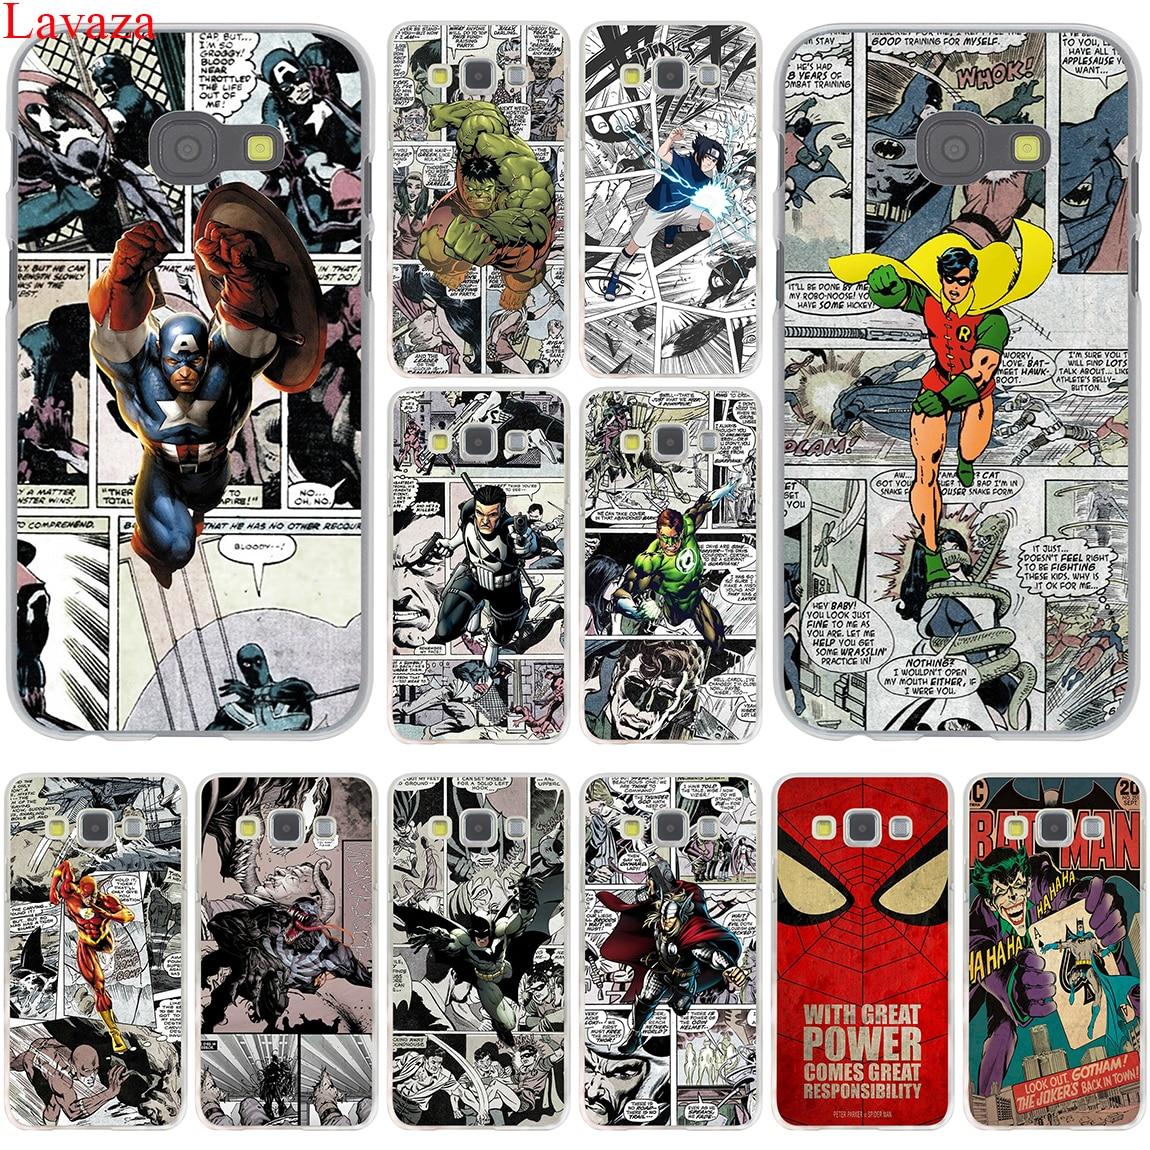 Lavaza Бэтмен Человек-паук Wonder Woman трудная для Samsung Galaxy A3 A5 A7 A8 2015 2016 2017 2018 Grand Prime примечание 8 5 4 3 2